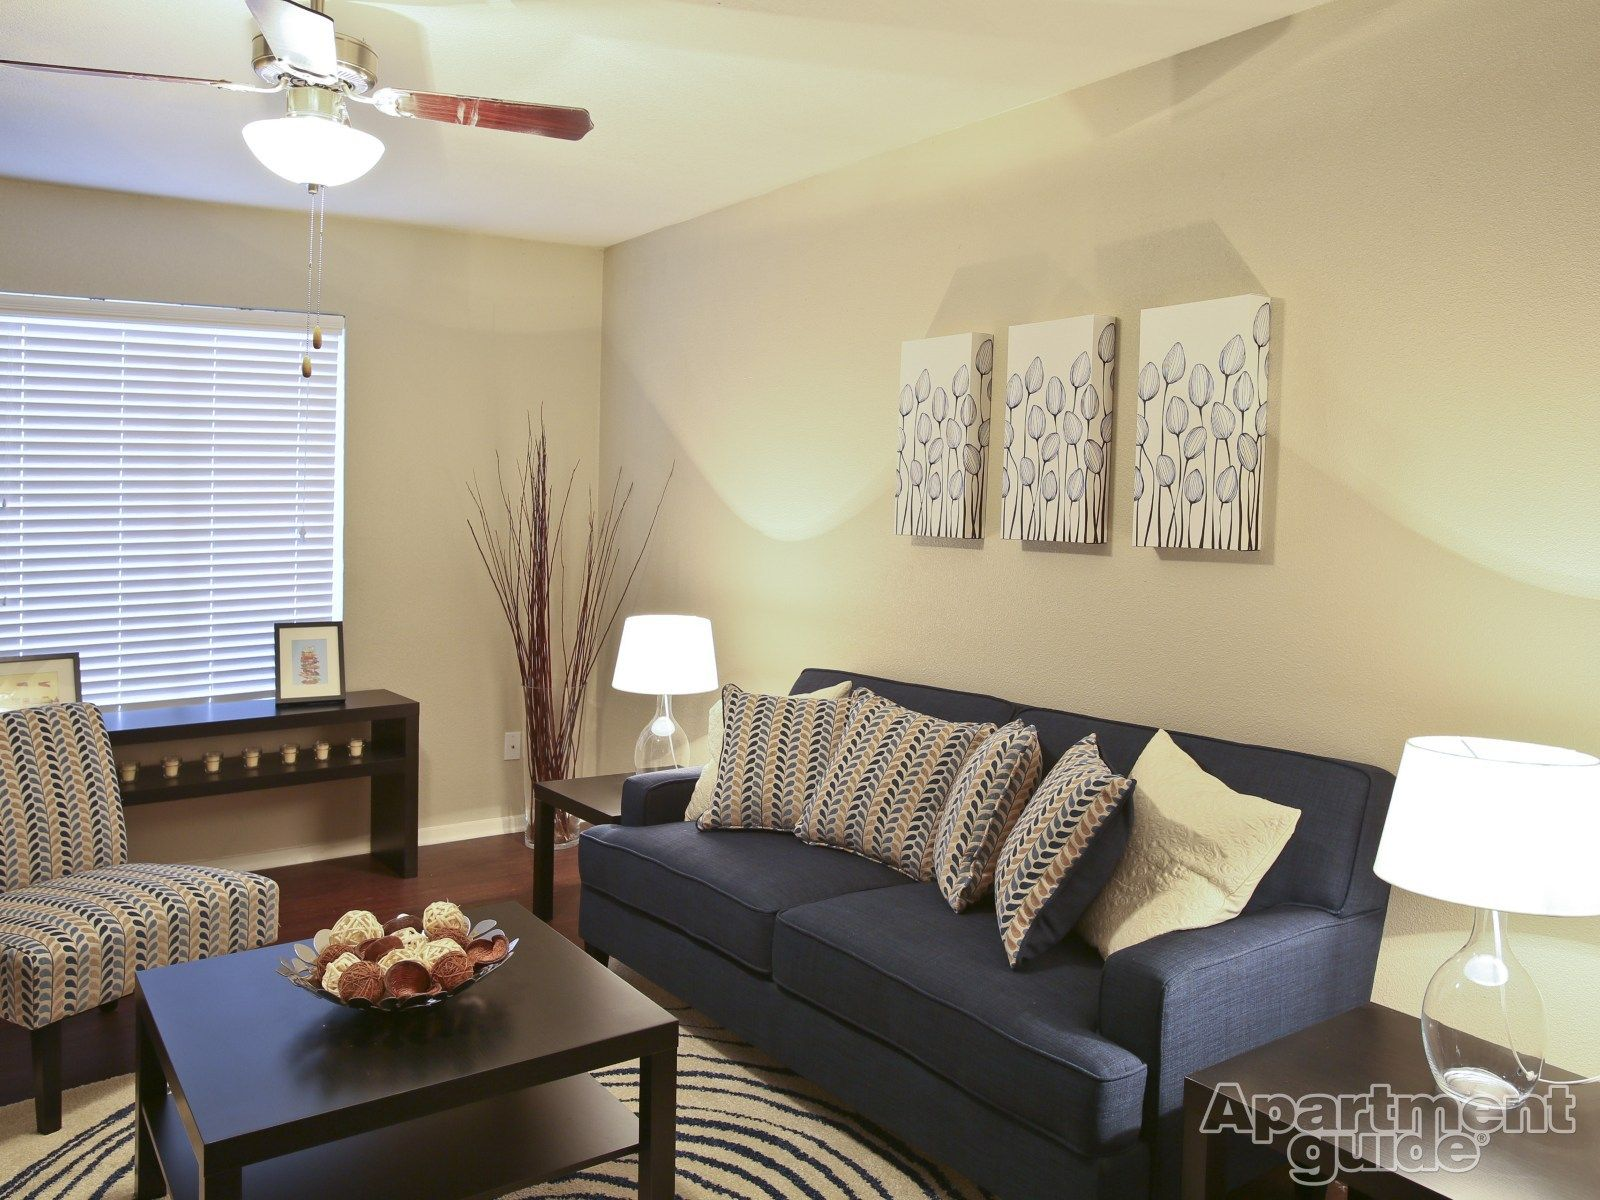 Solaris Affordable Apartment Homes Apartments